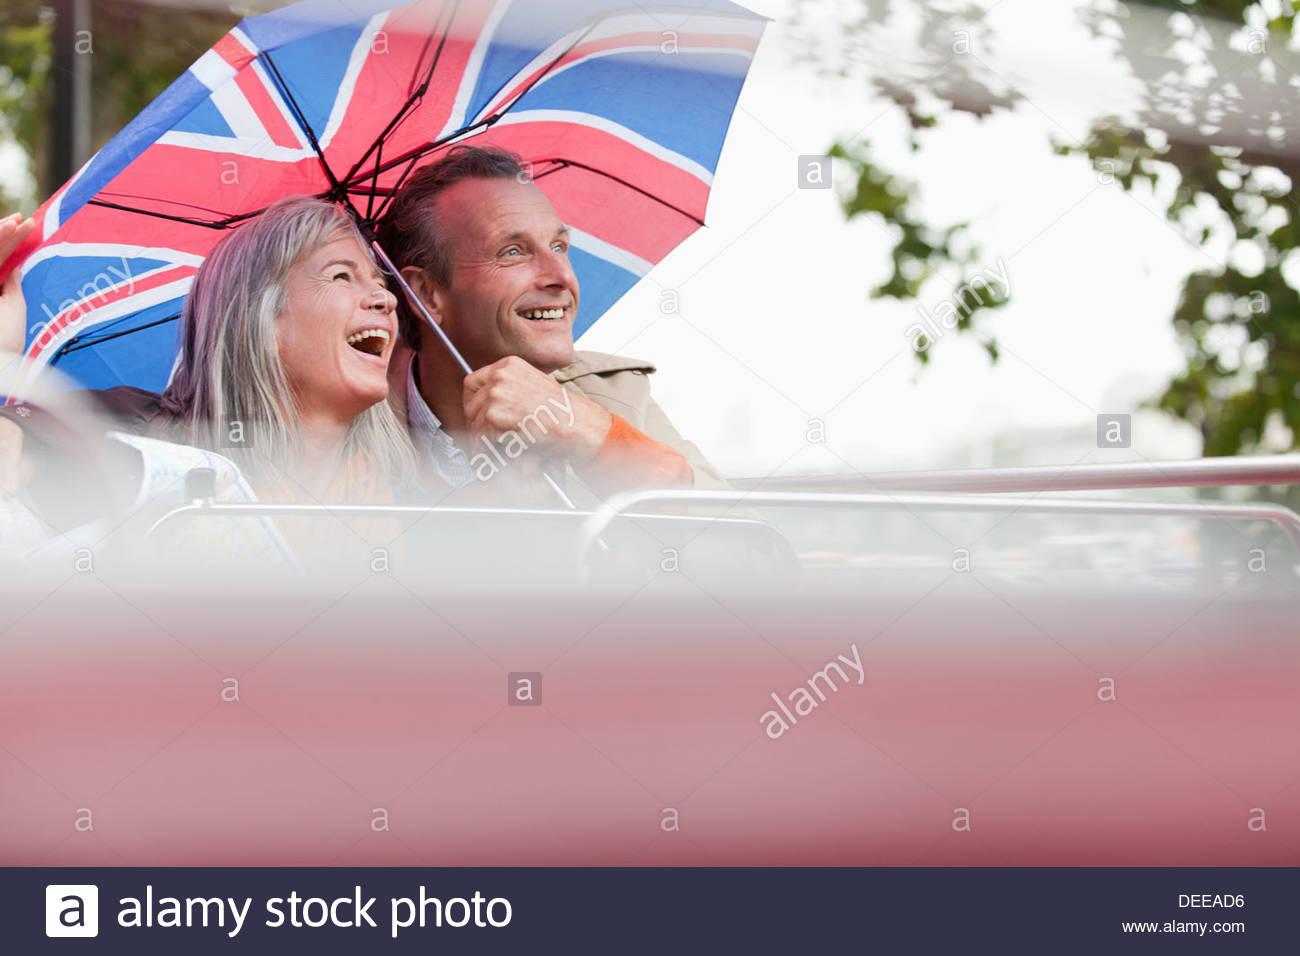 Feliz pareja con bandera británica paraguas caballo double decker bus Imagen De Stock